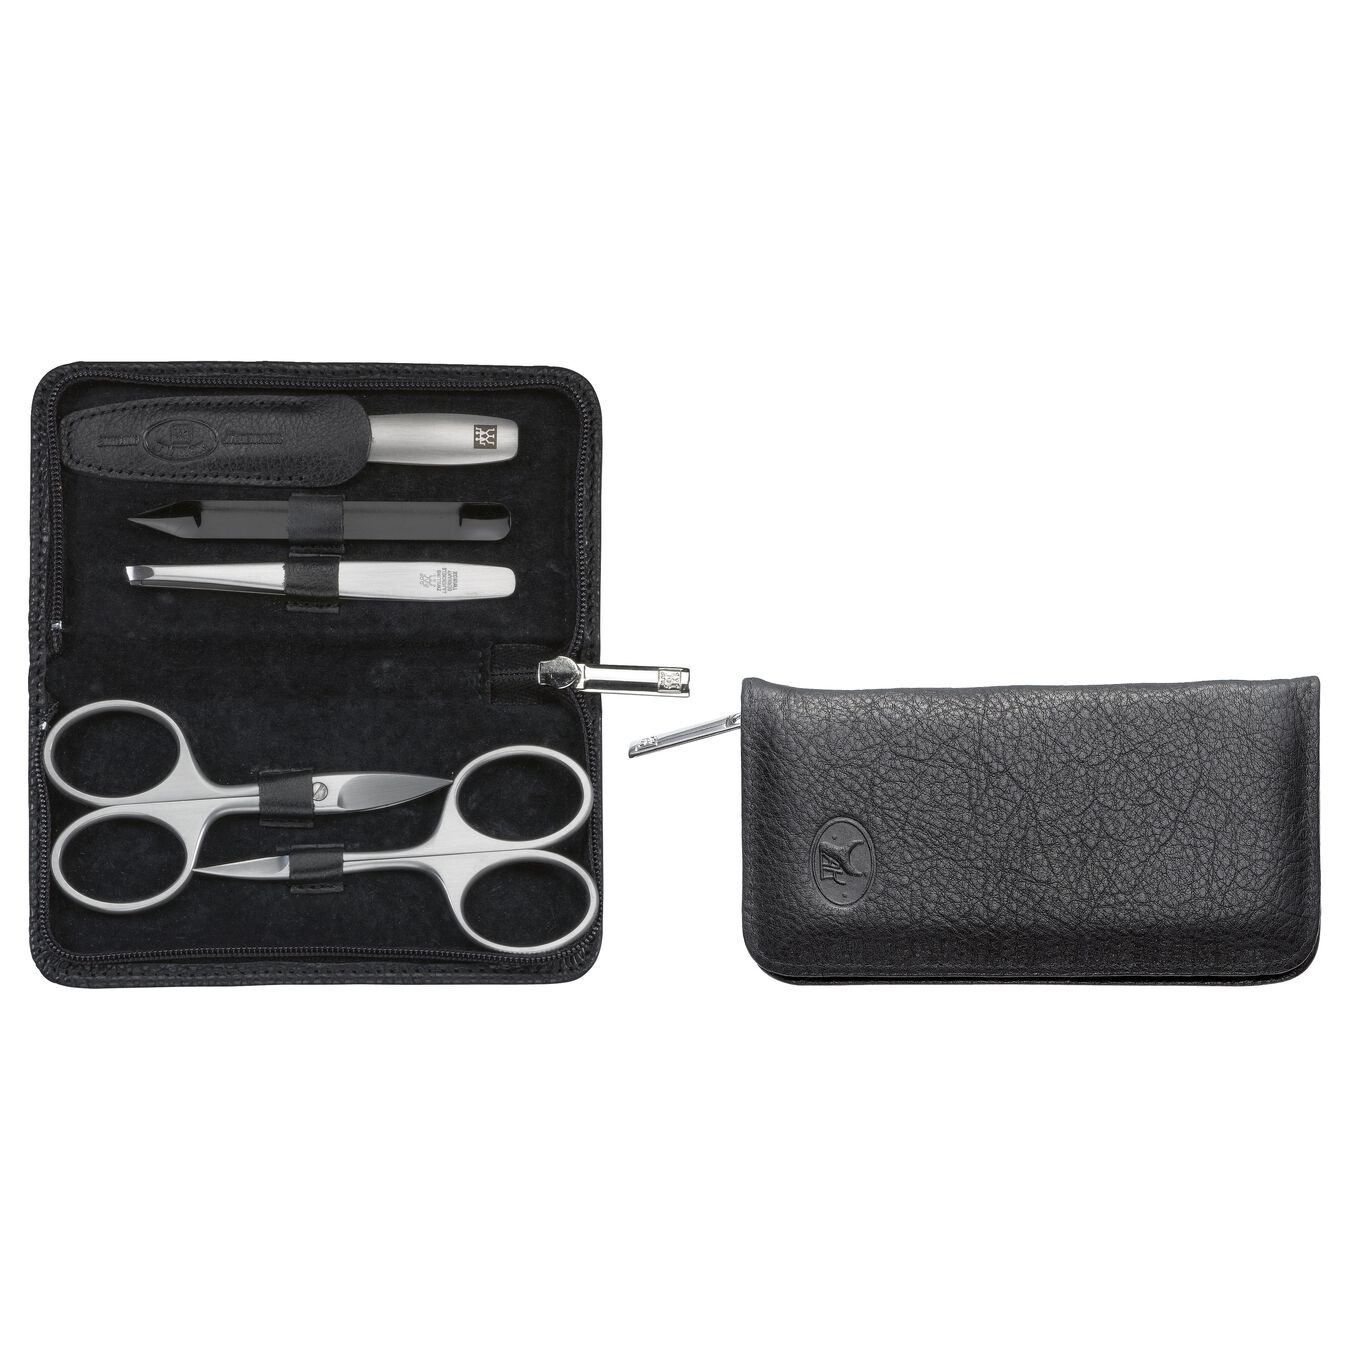 Zip fastener case, 5 Piece | Yak leather | Black,,large 2